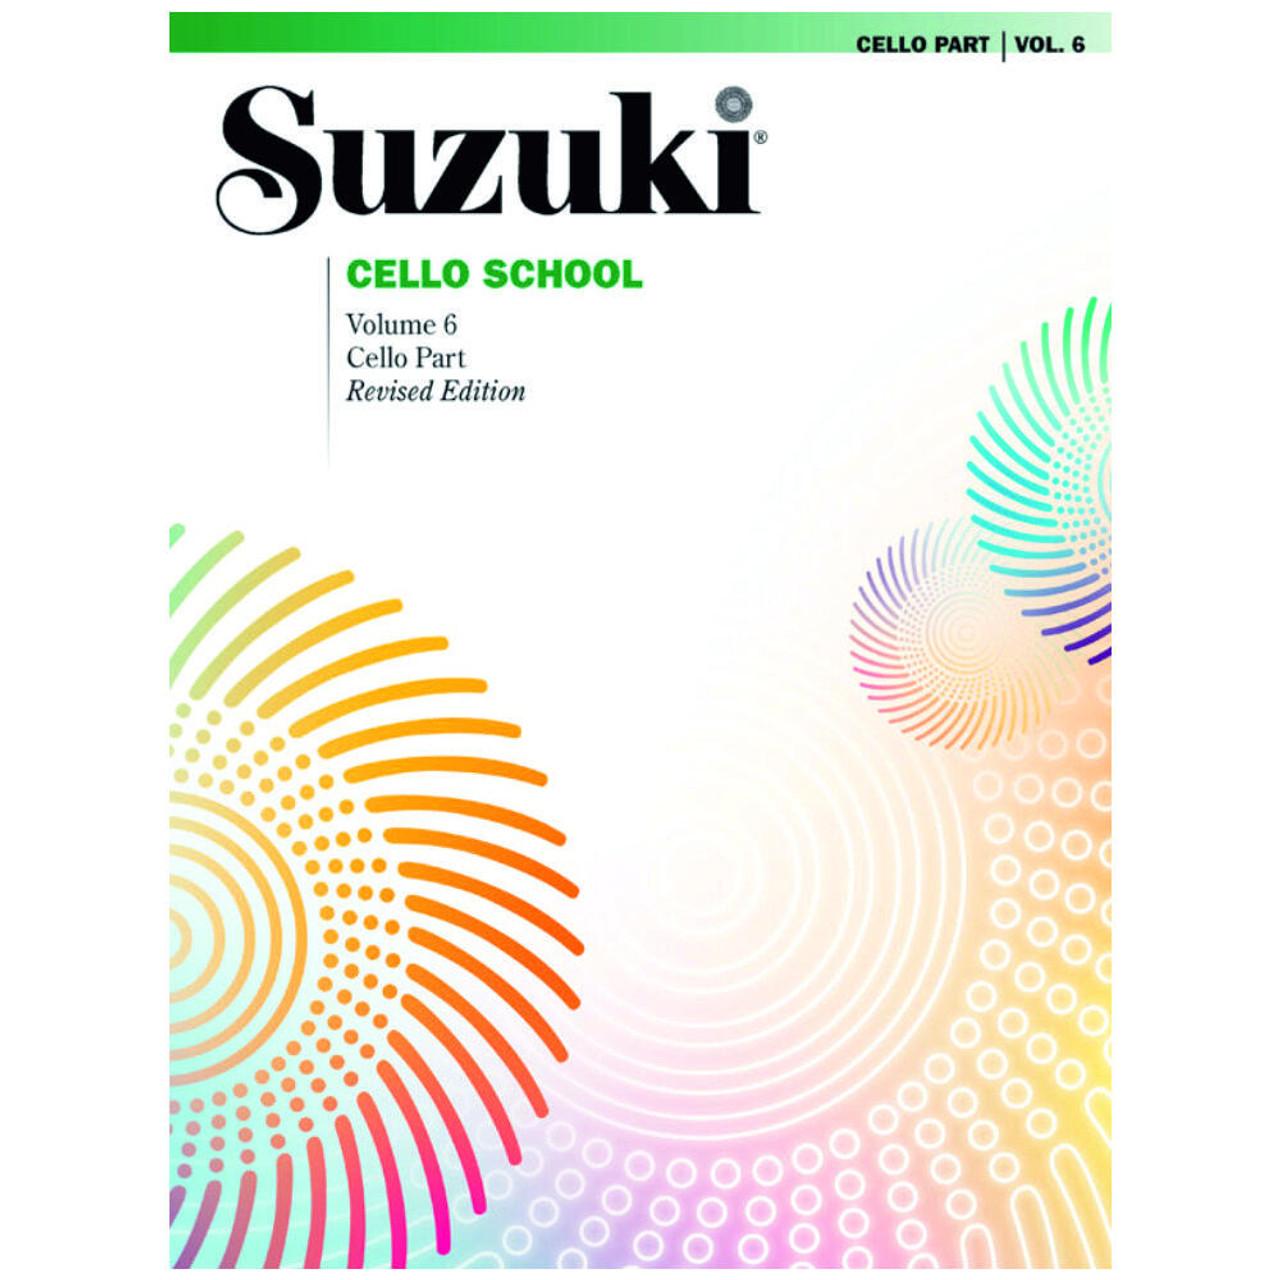 Suzuki Cello School Cello Part Volume 6 Revised